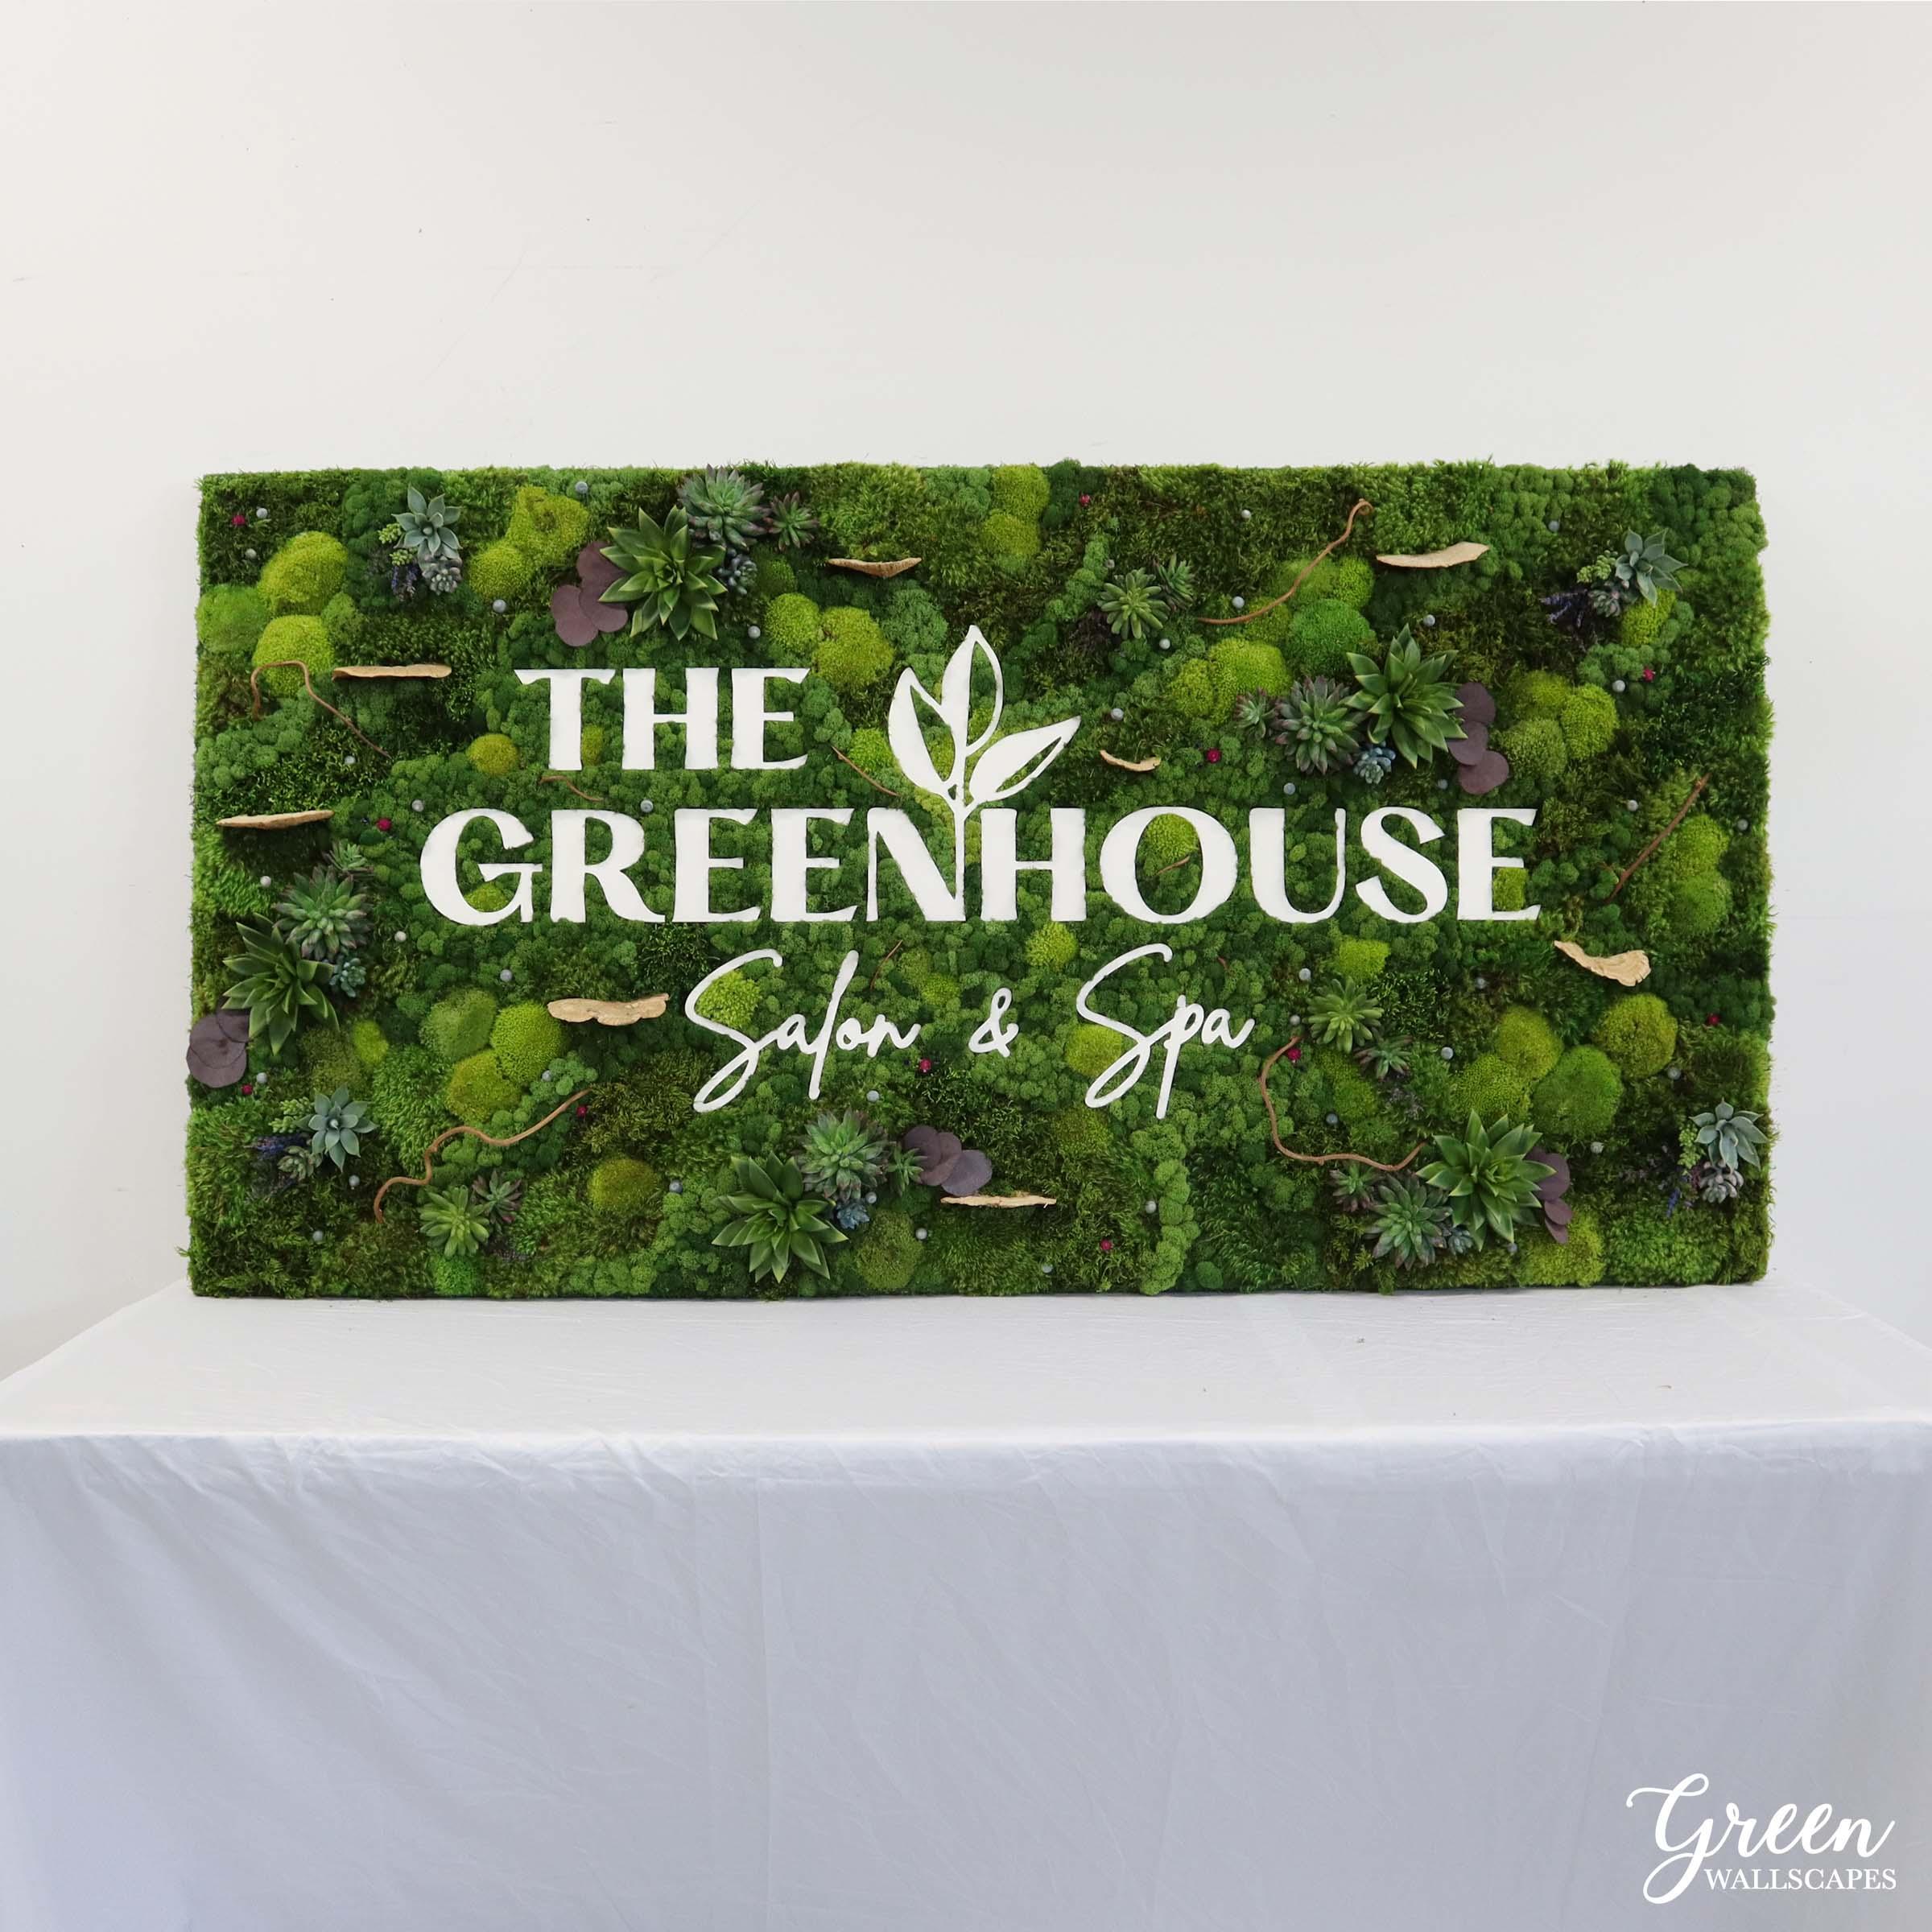 greenhouse_spa_photo_2.jpg